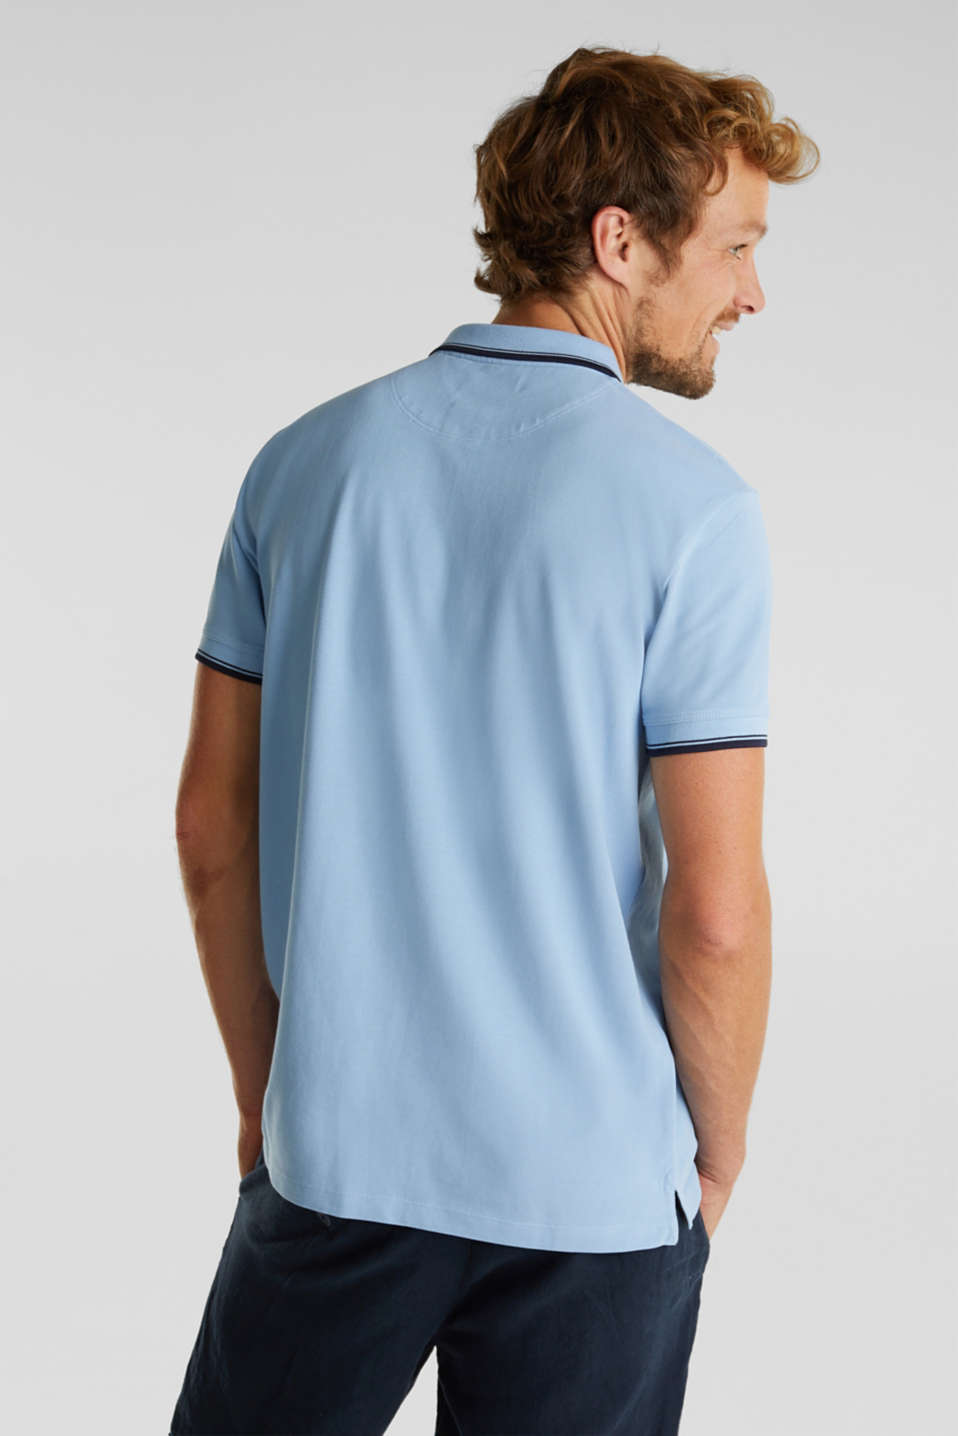 Piqué polo shirt in 100% cotton, LIGHT BLUE, detail image number 3